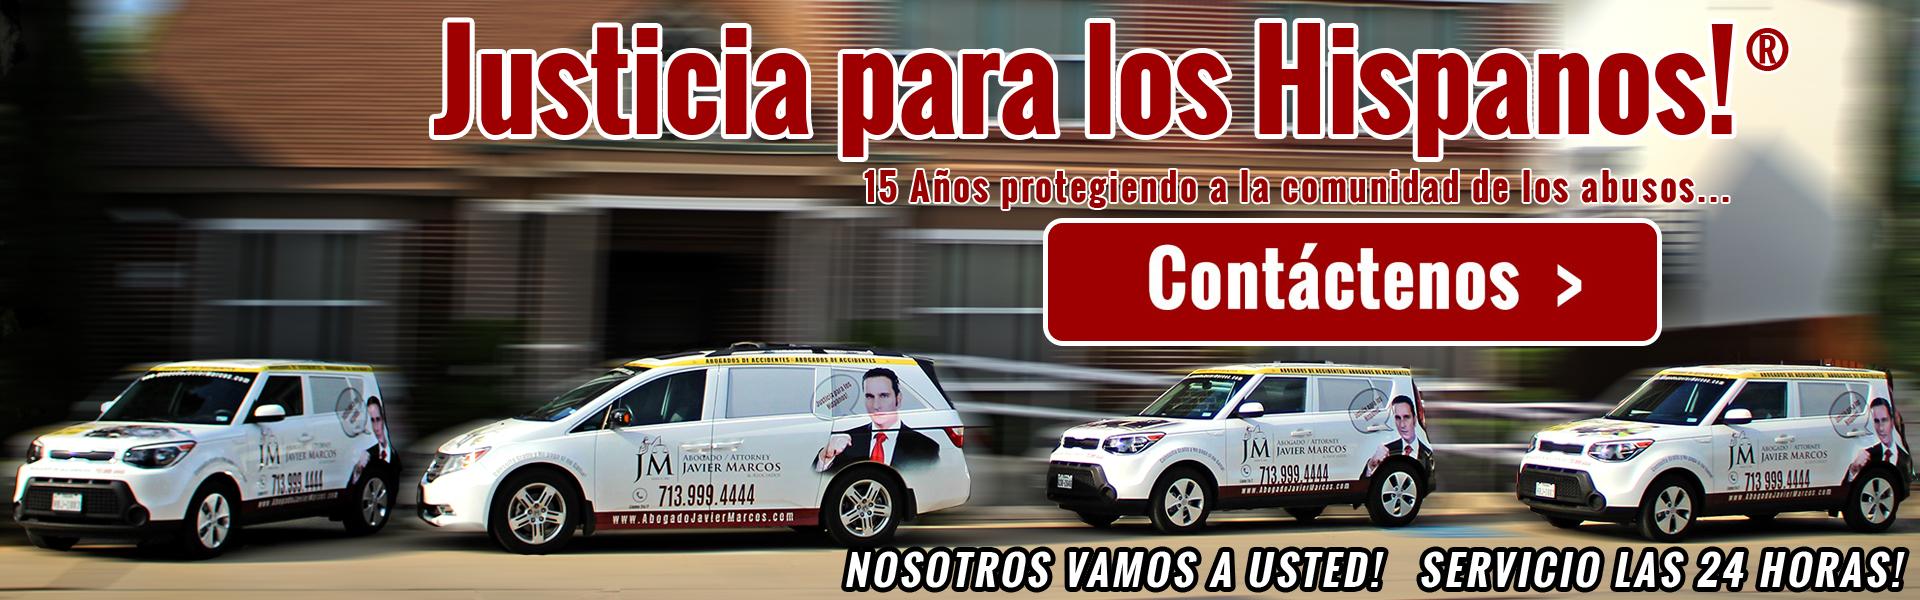 Abogado de accidentes   Abogado Javier Marcos   713.999.4444